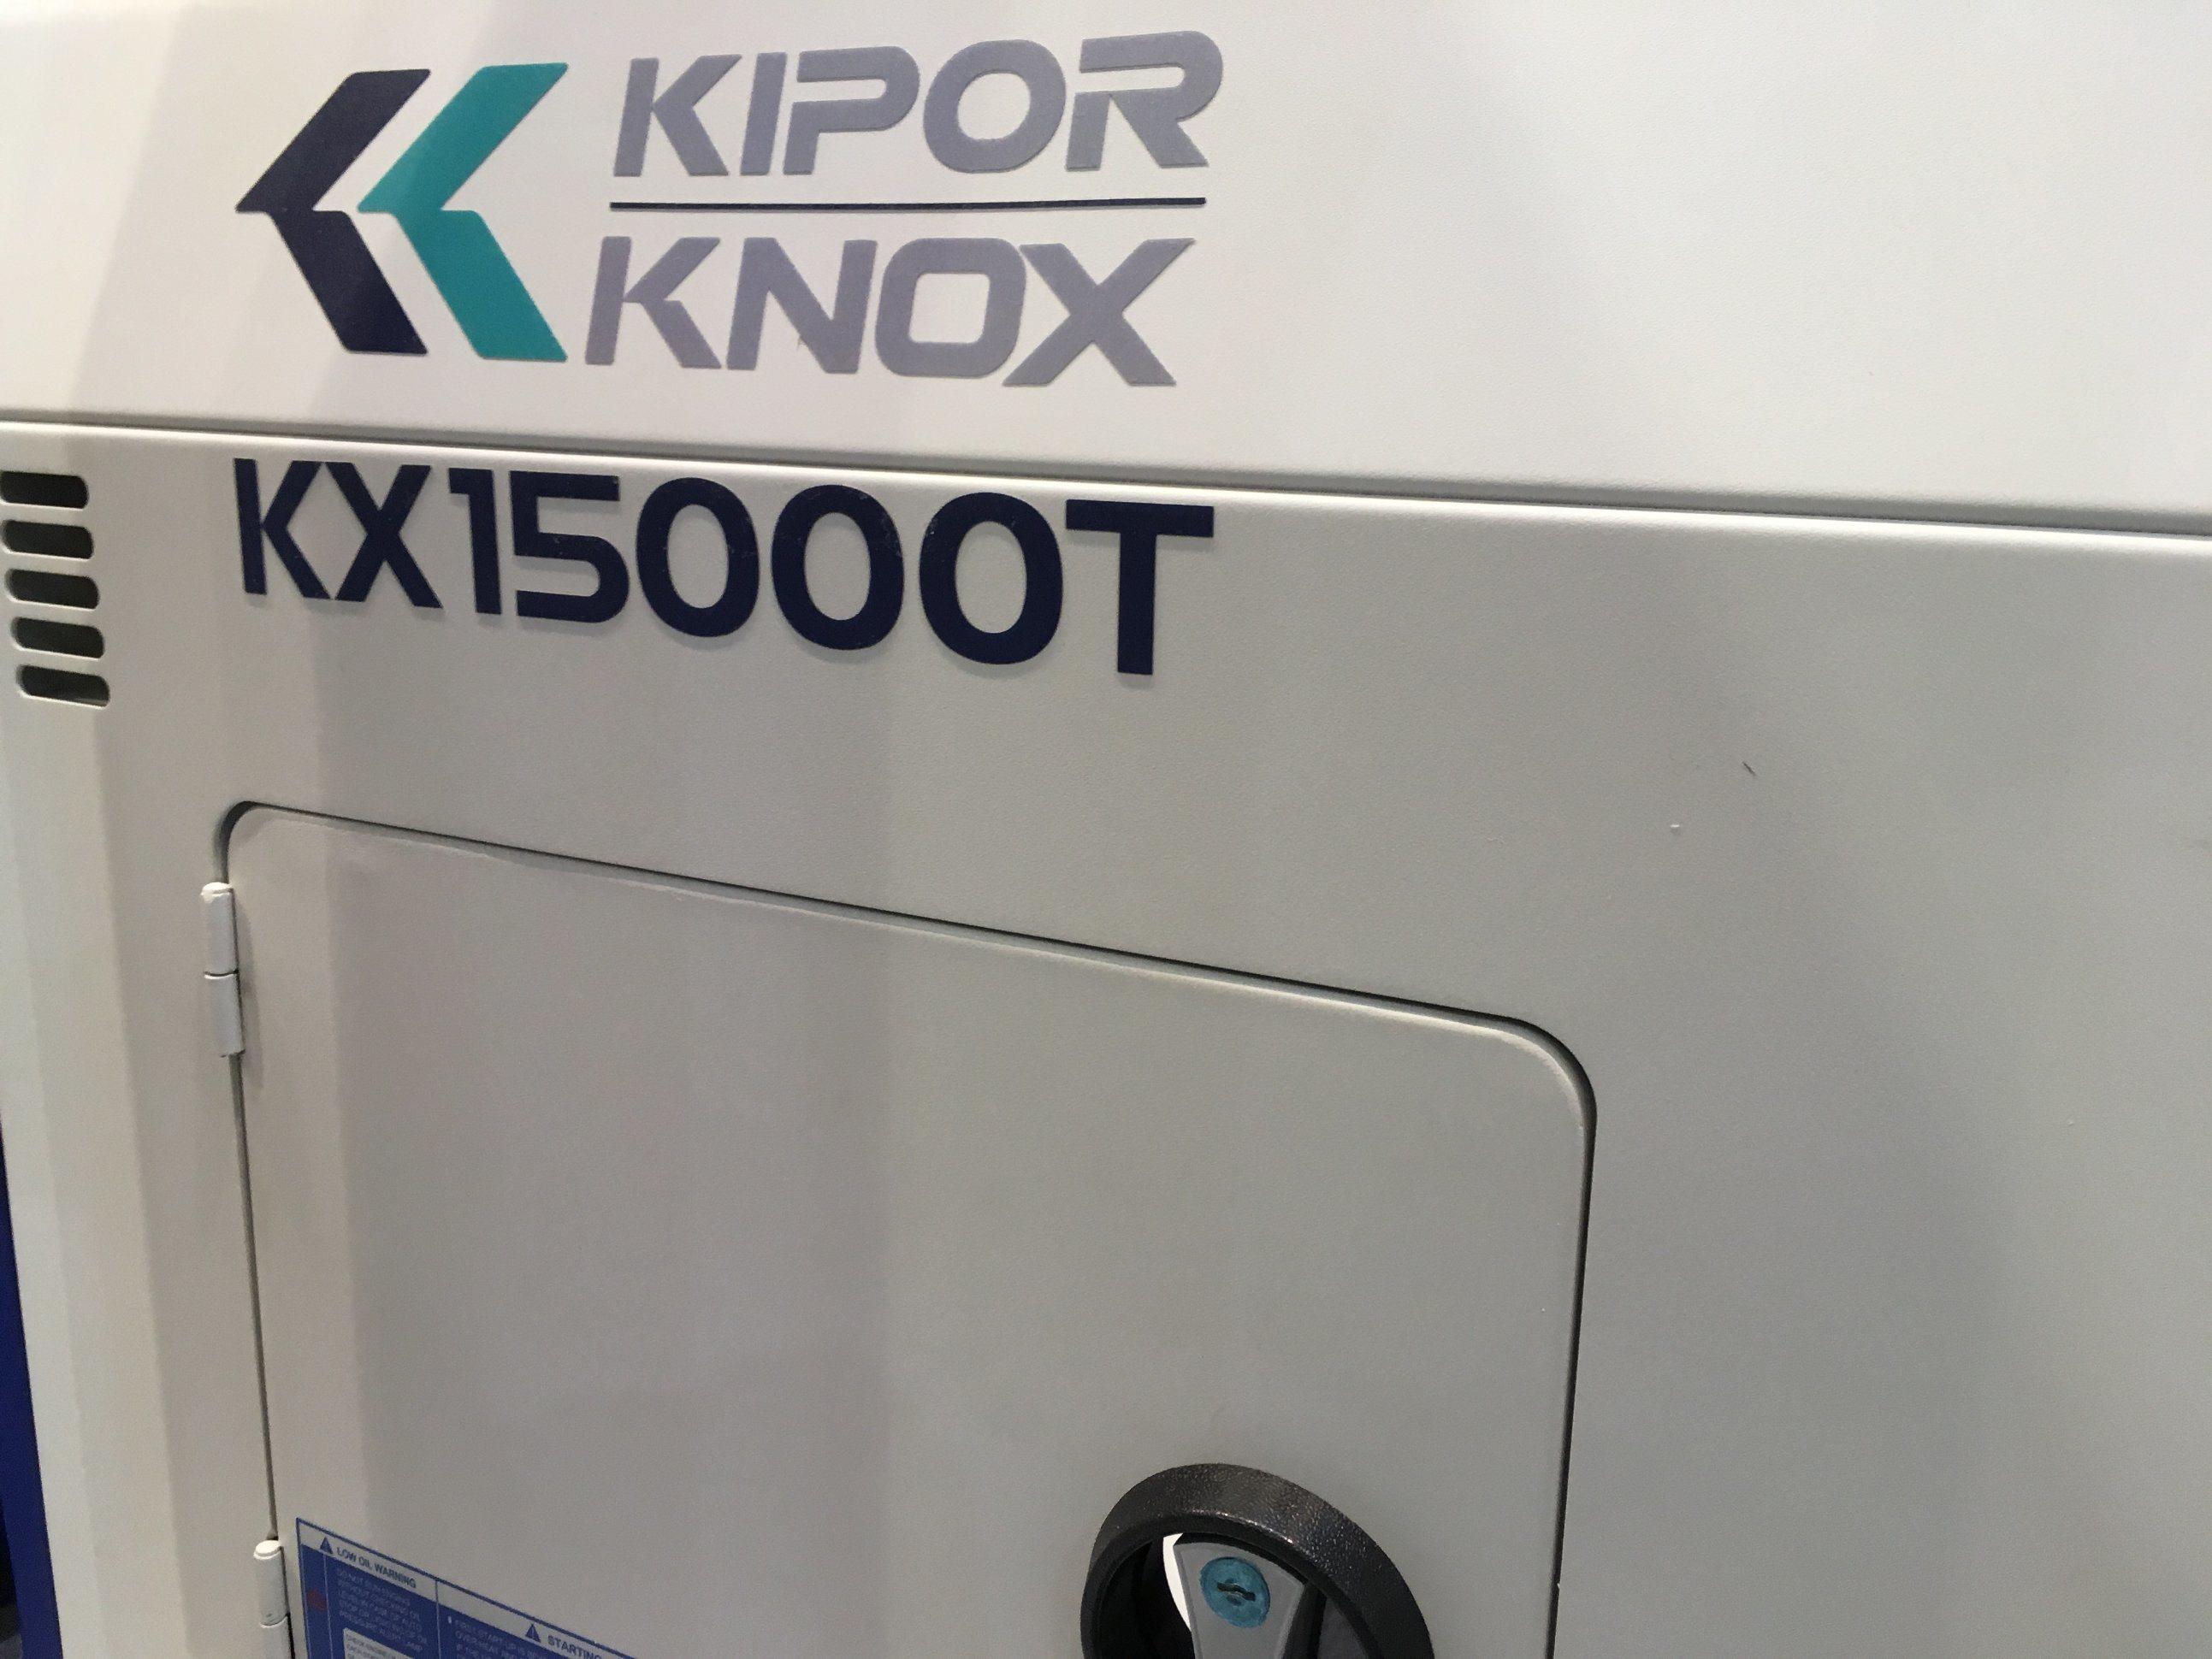 Kipor 10kVA Silent Portable Genset with Kipor Diesel Engine